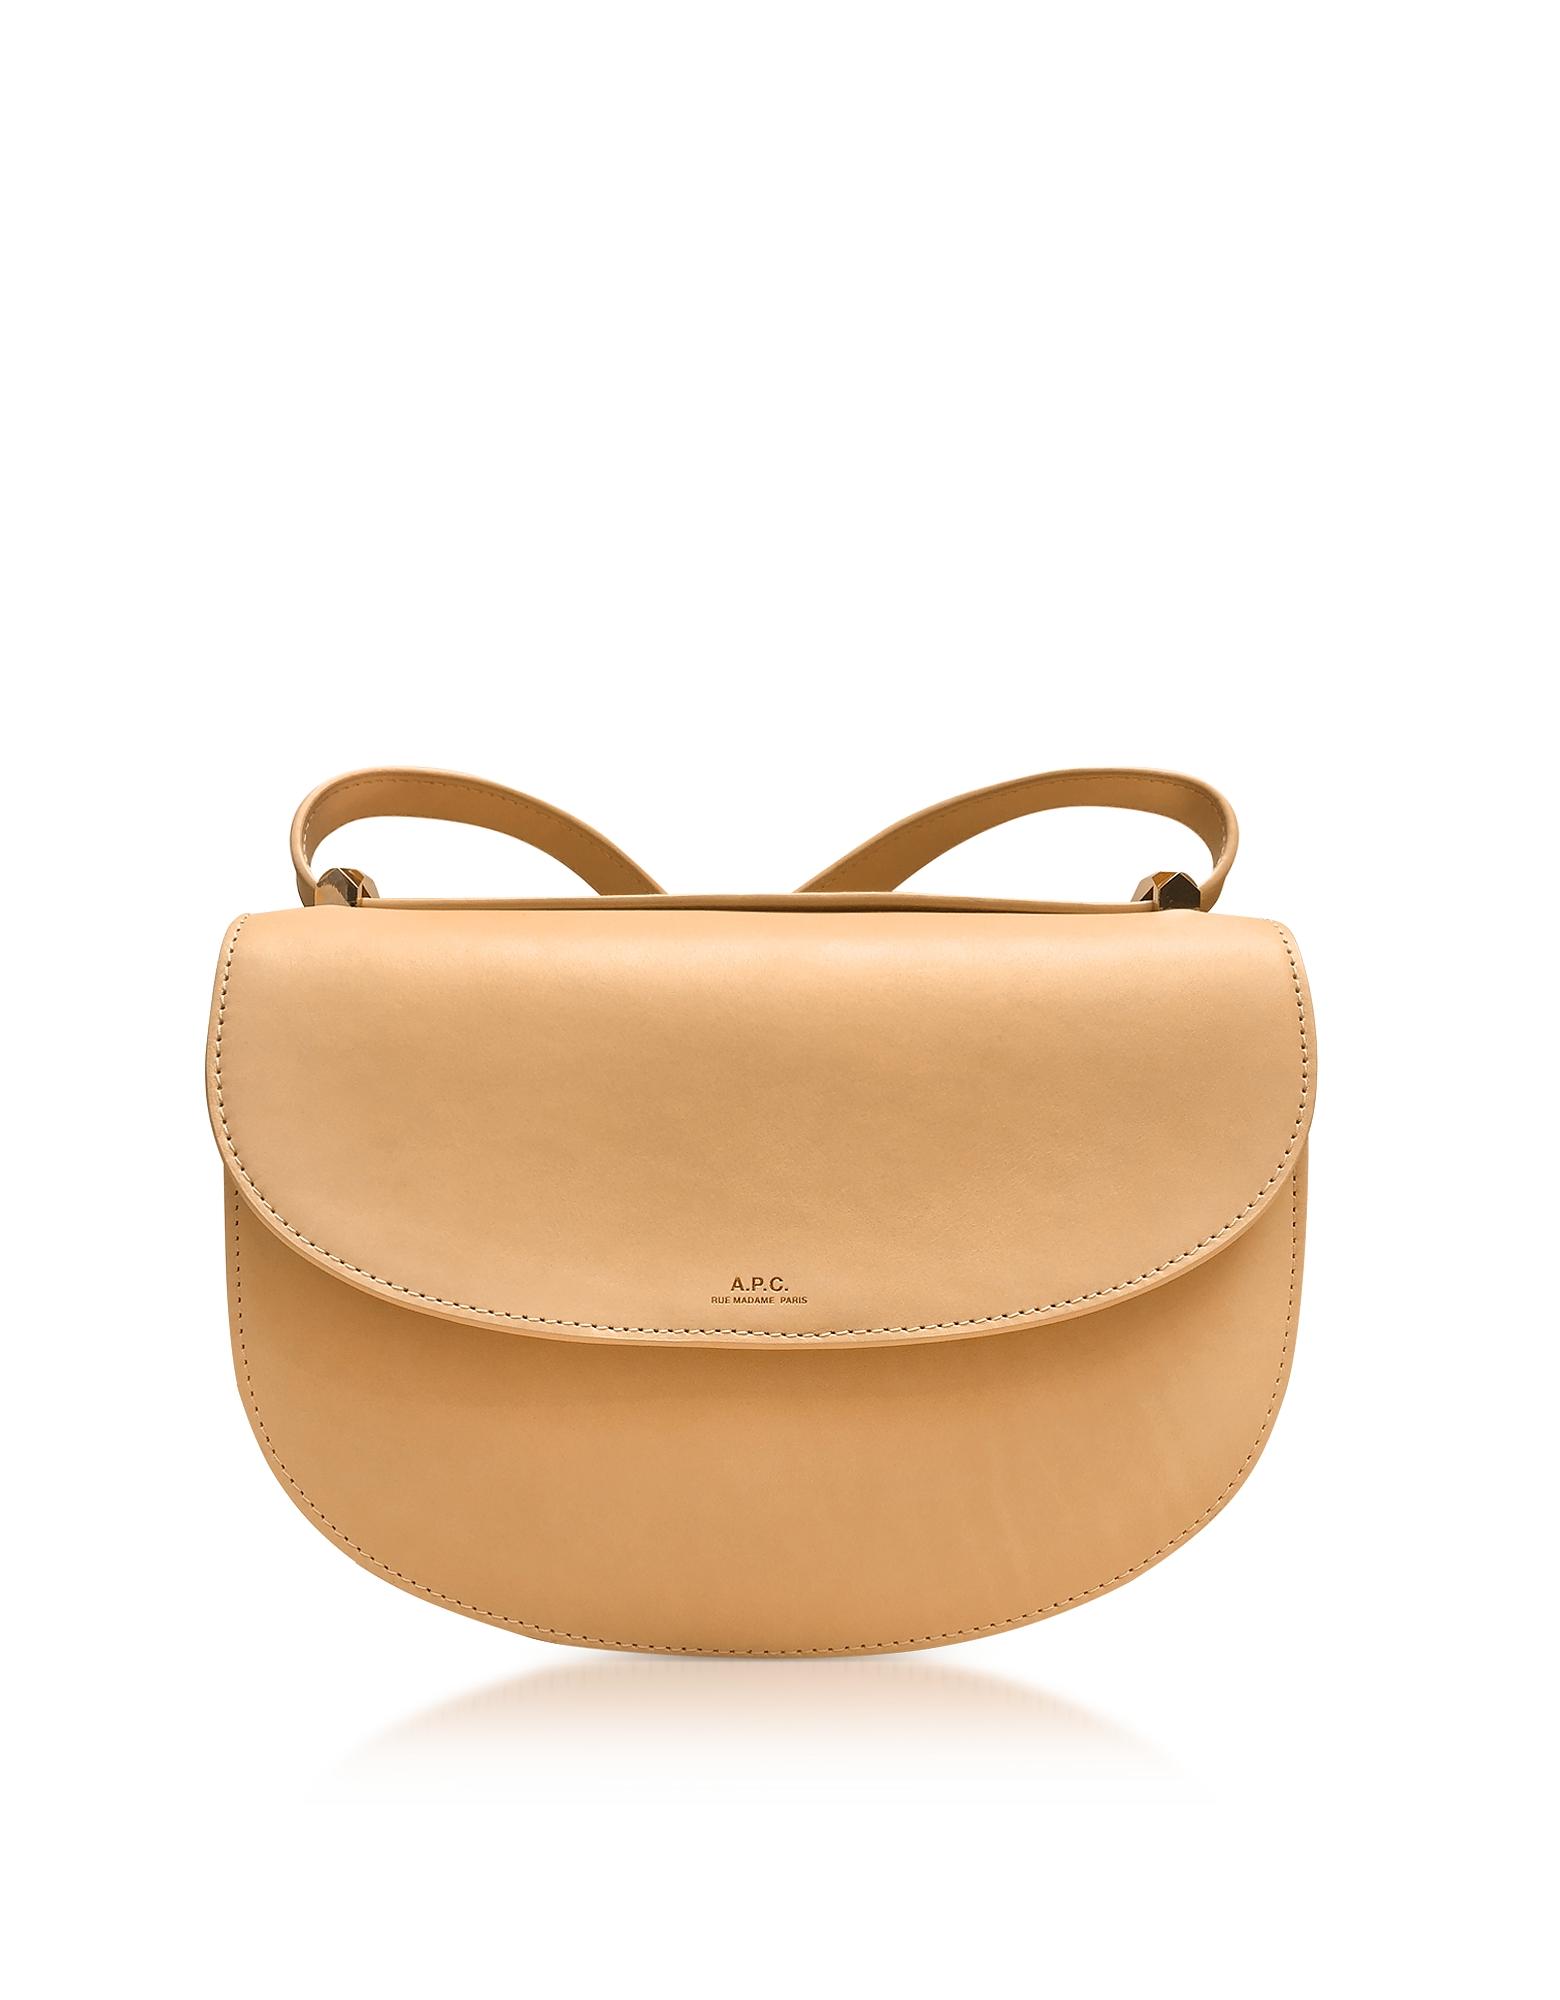 A.P.C. Handbags, Beige Geneve Leather Crossbody Bag